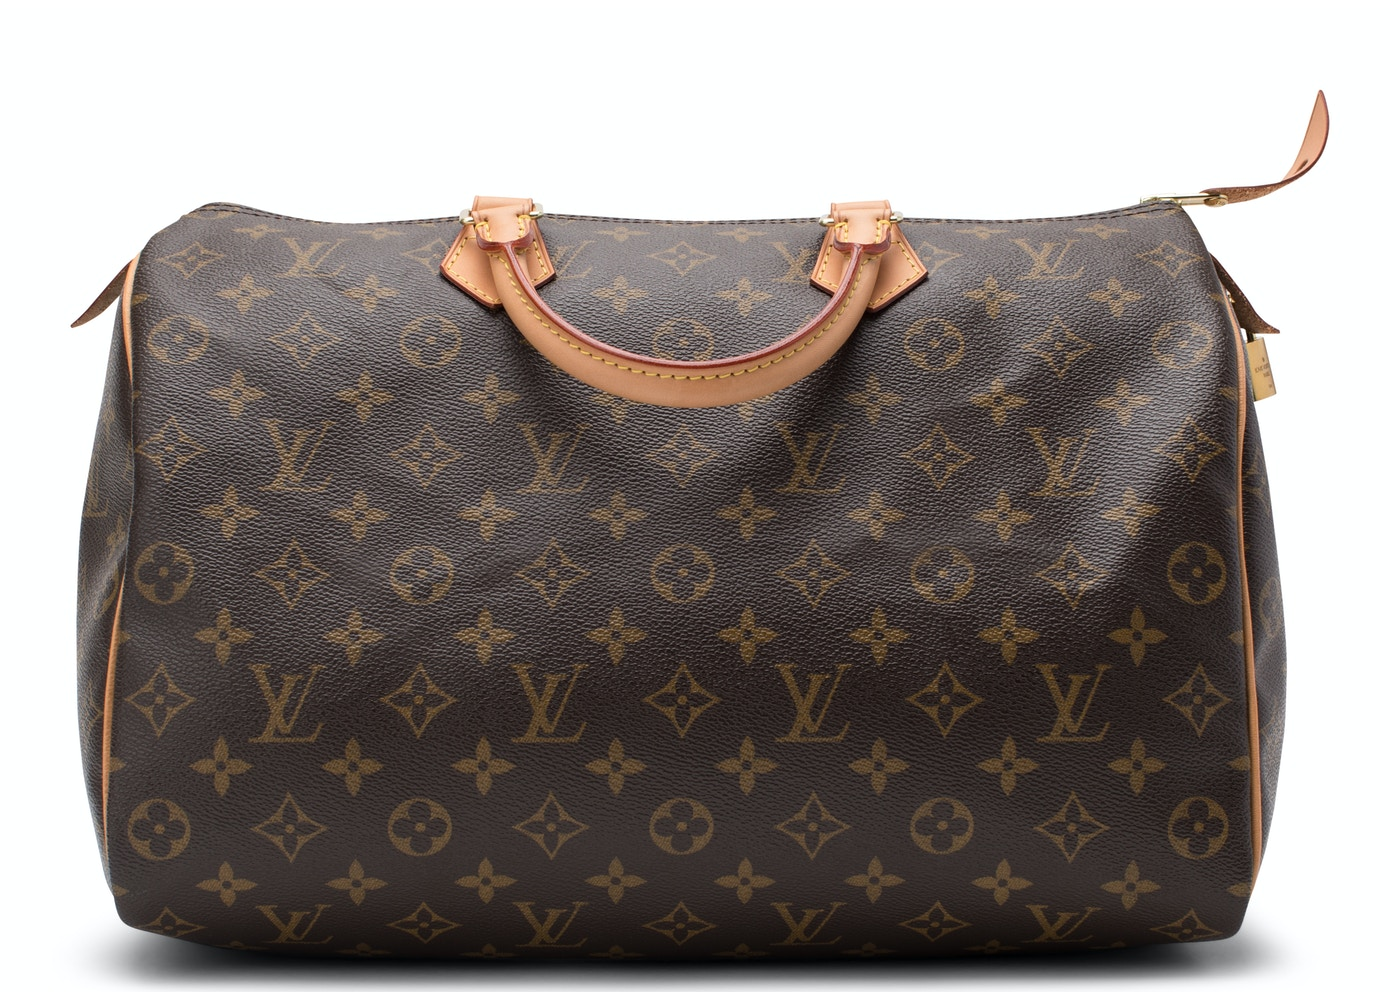 743ad89d54b Louis Vuitton Speedy Monogram 30 Brown. Monogram 30 Brown